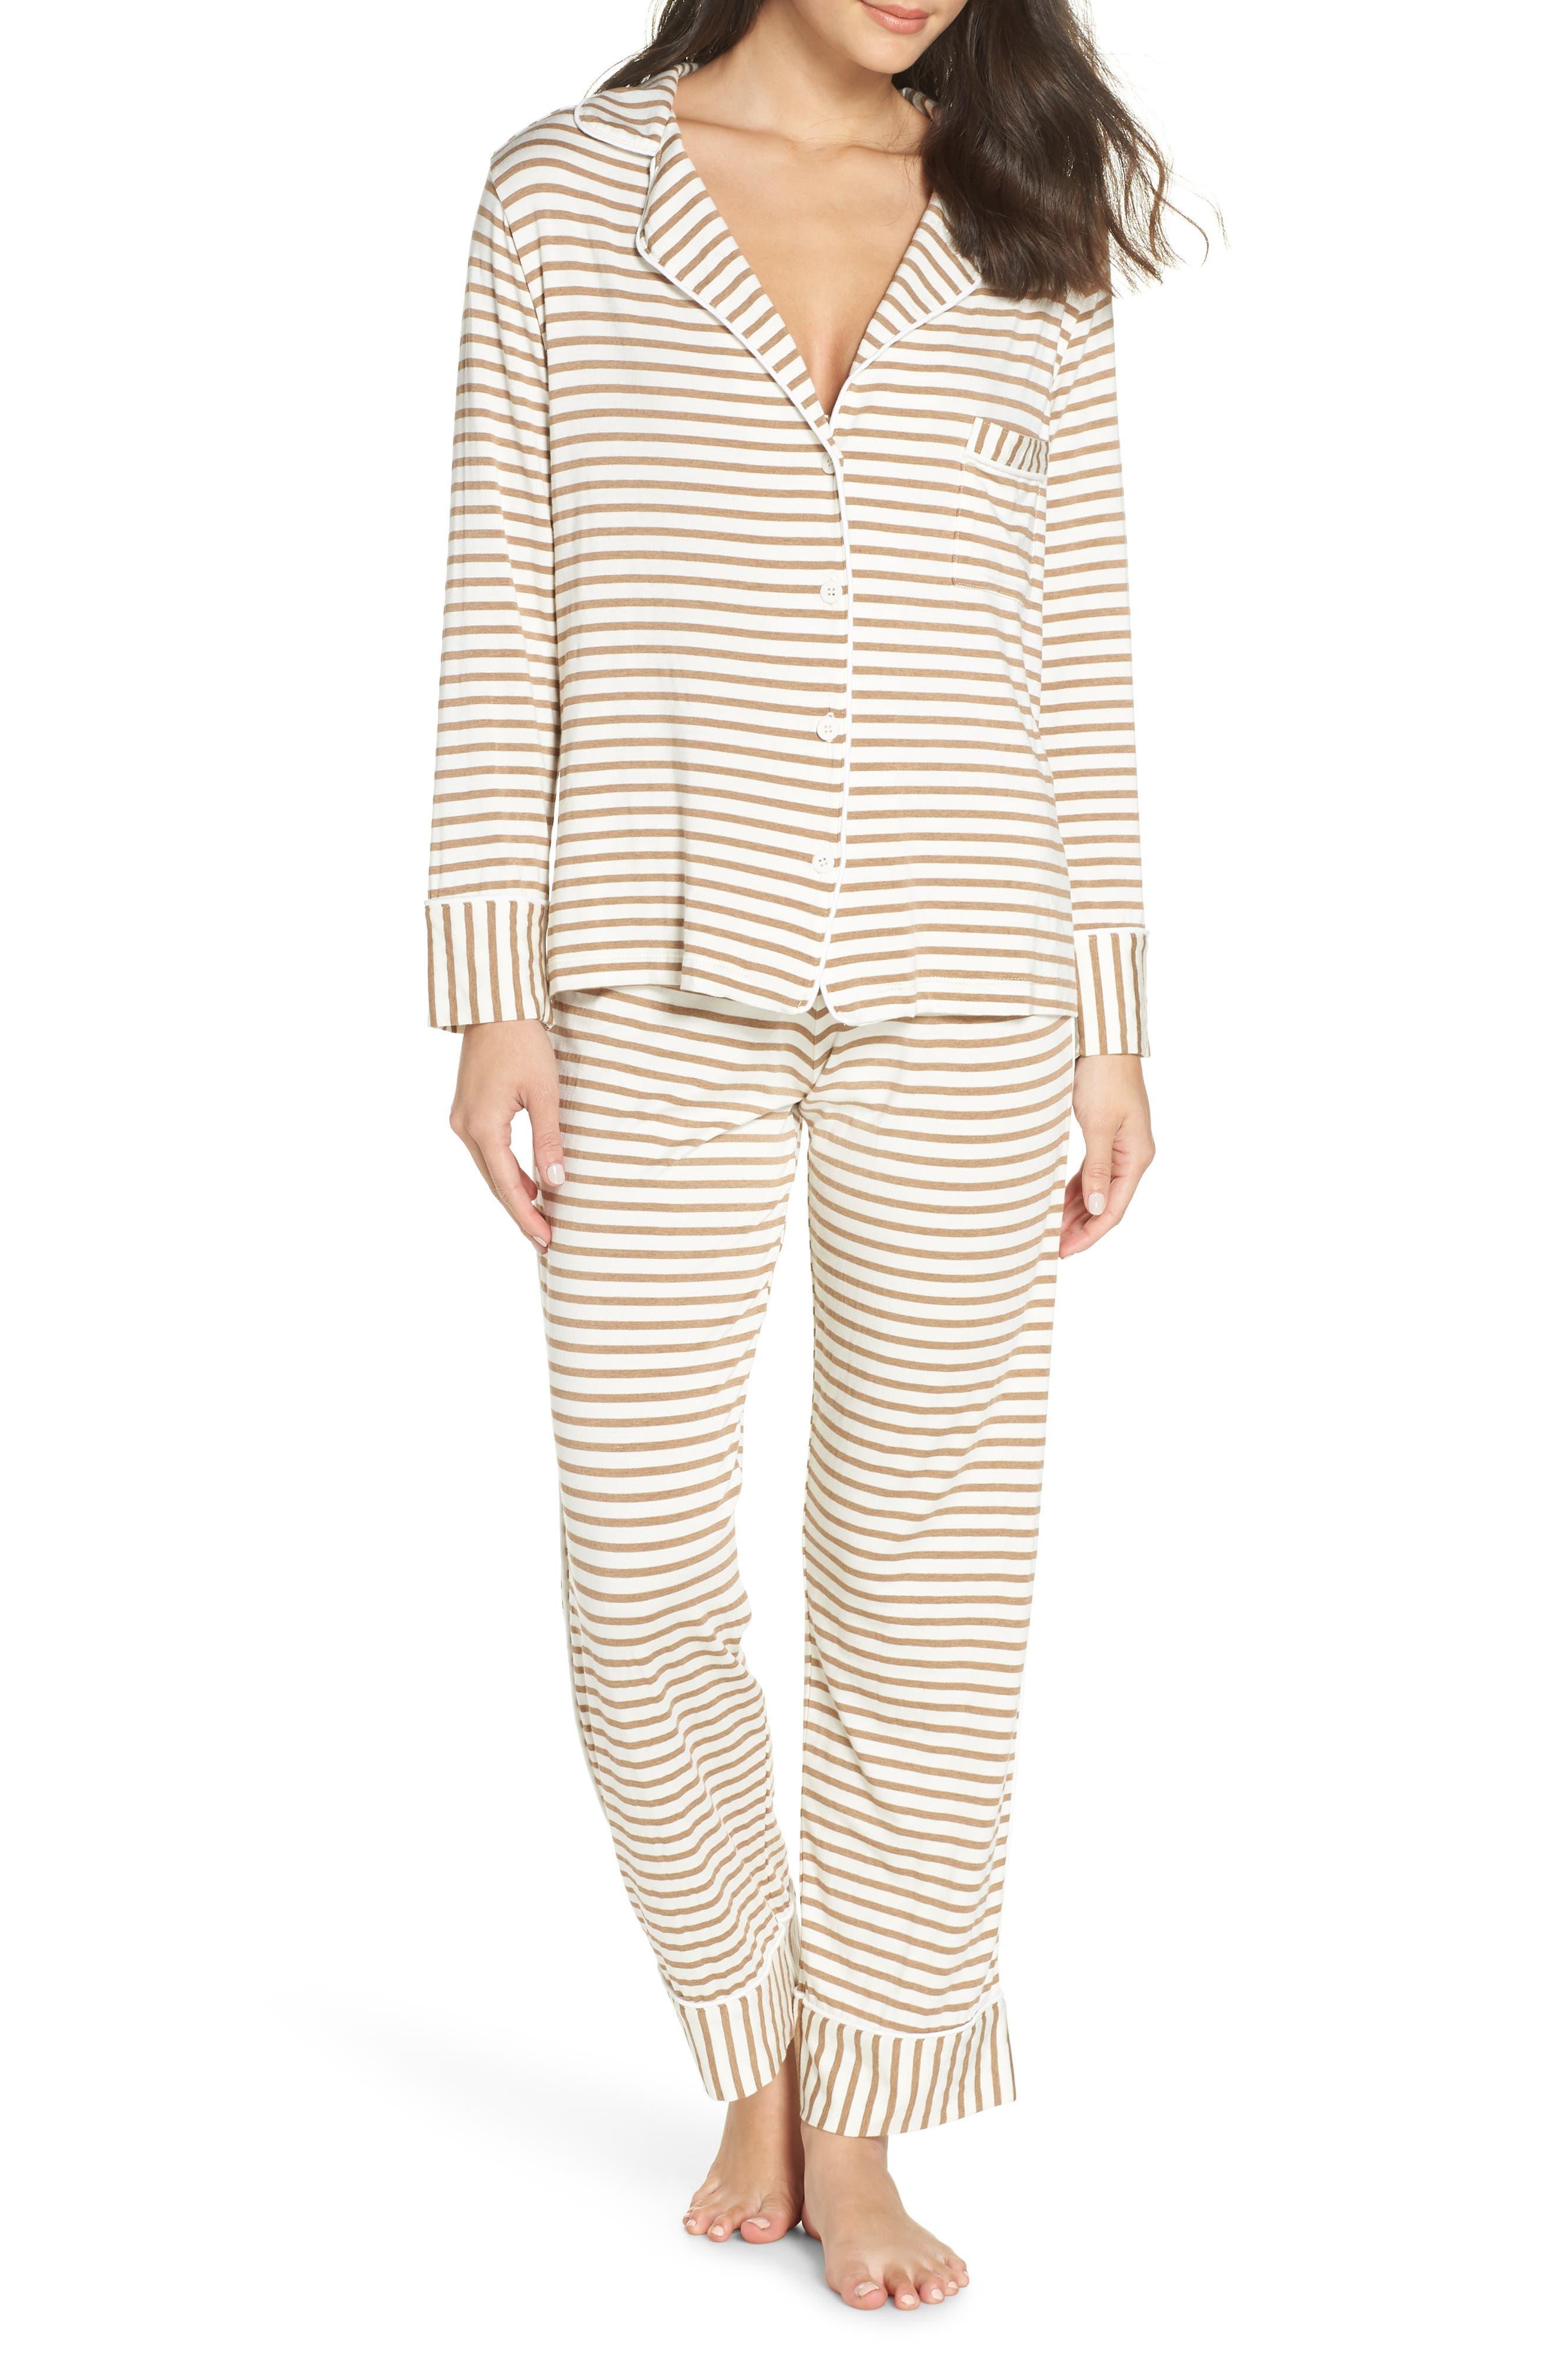 Monaco Pajamas,                             Main thumbnail 1, color,                             CAMEL STRIPE